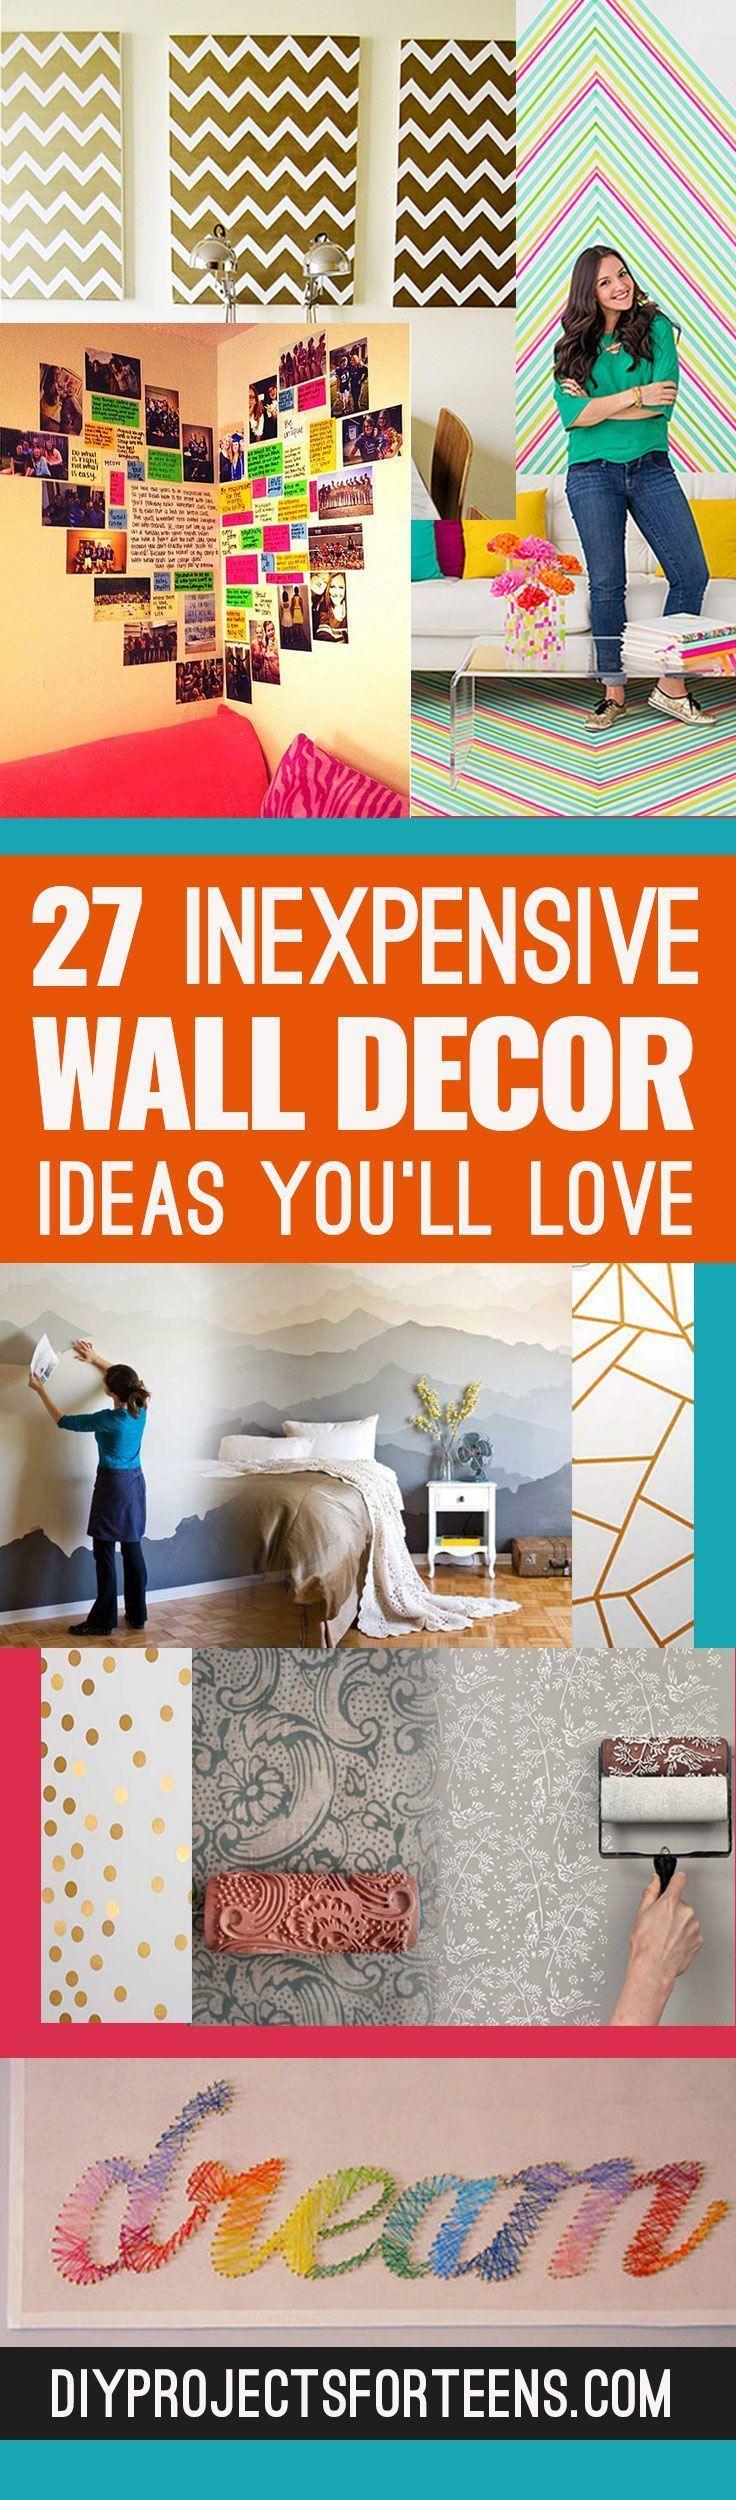 Cute DIY Wall Art Ideas You'll Love - Creative Room Decor ...